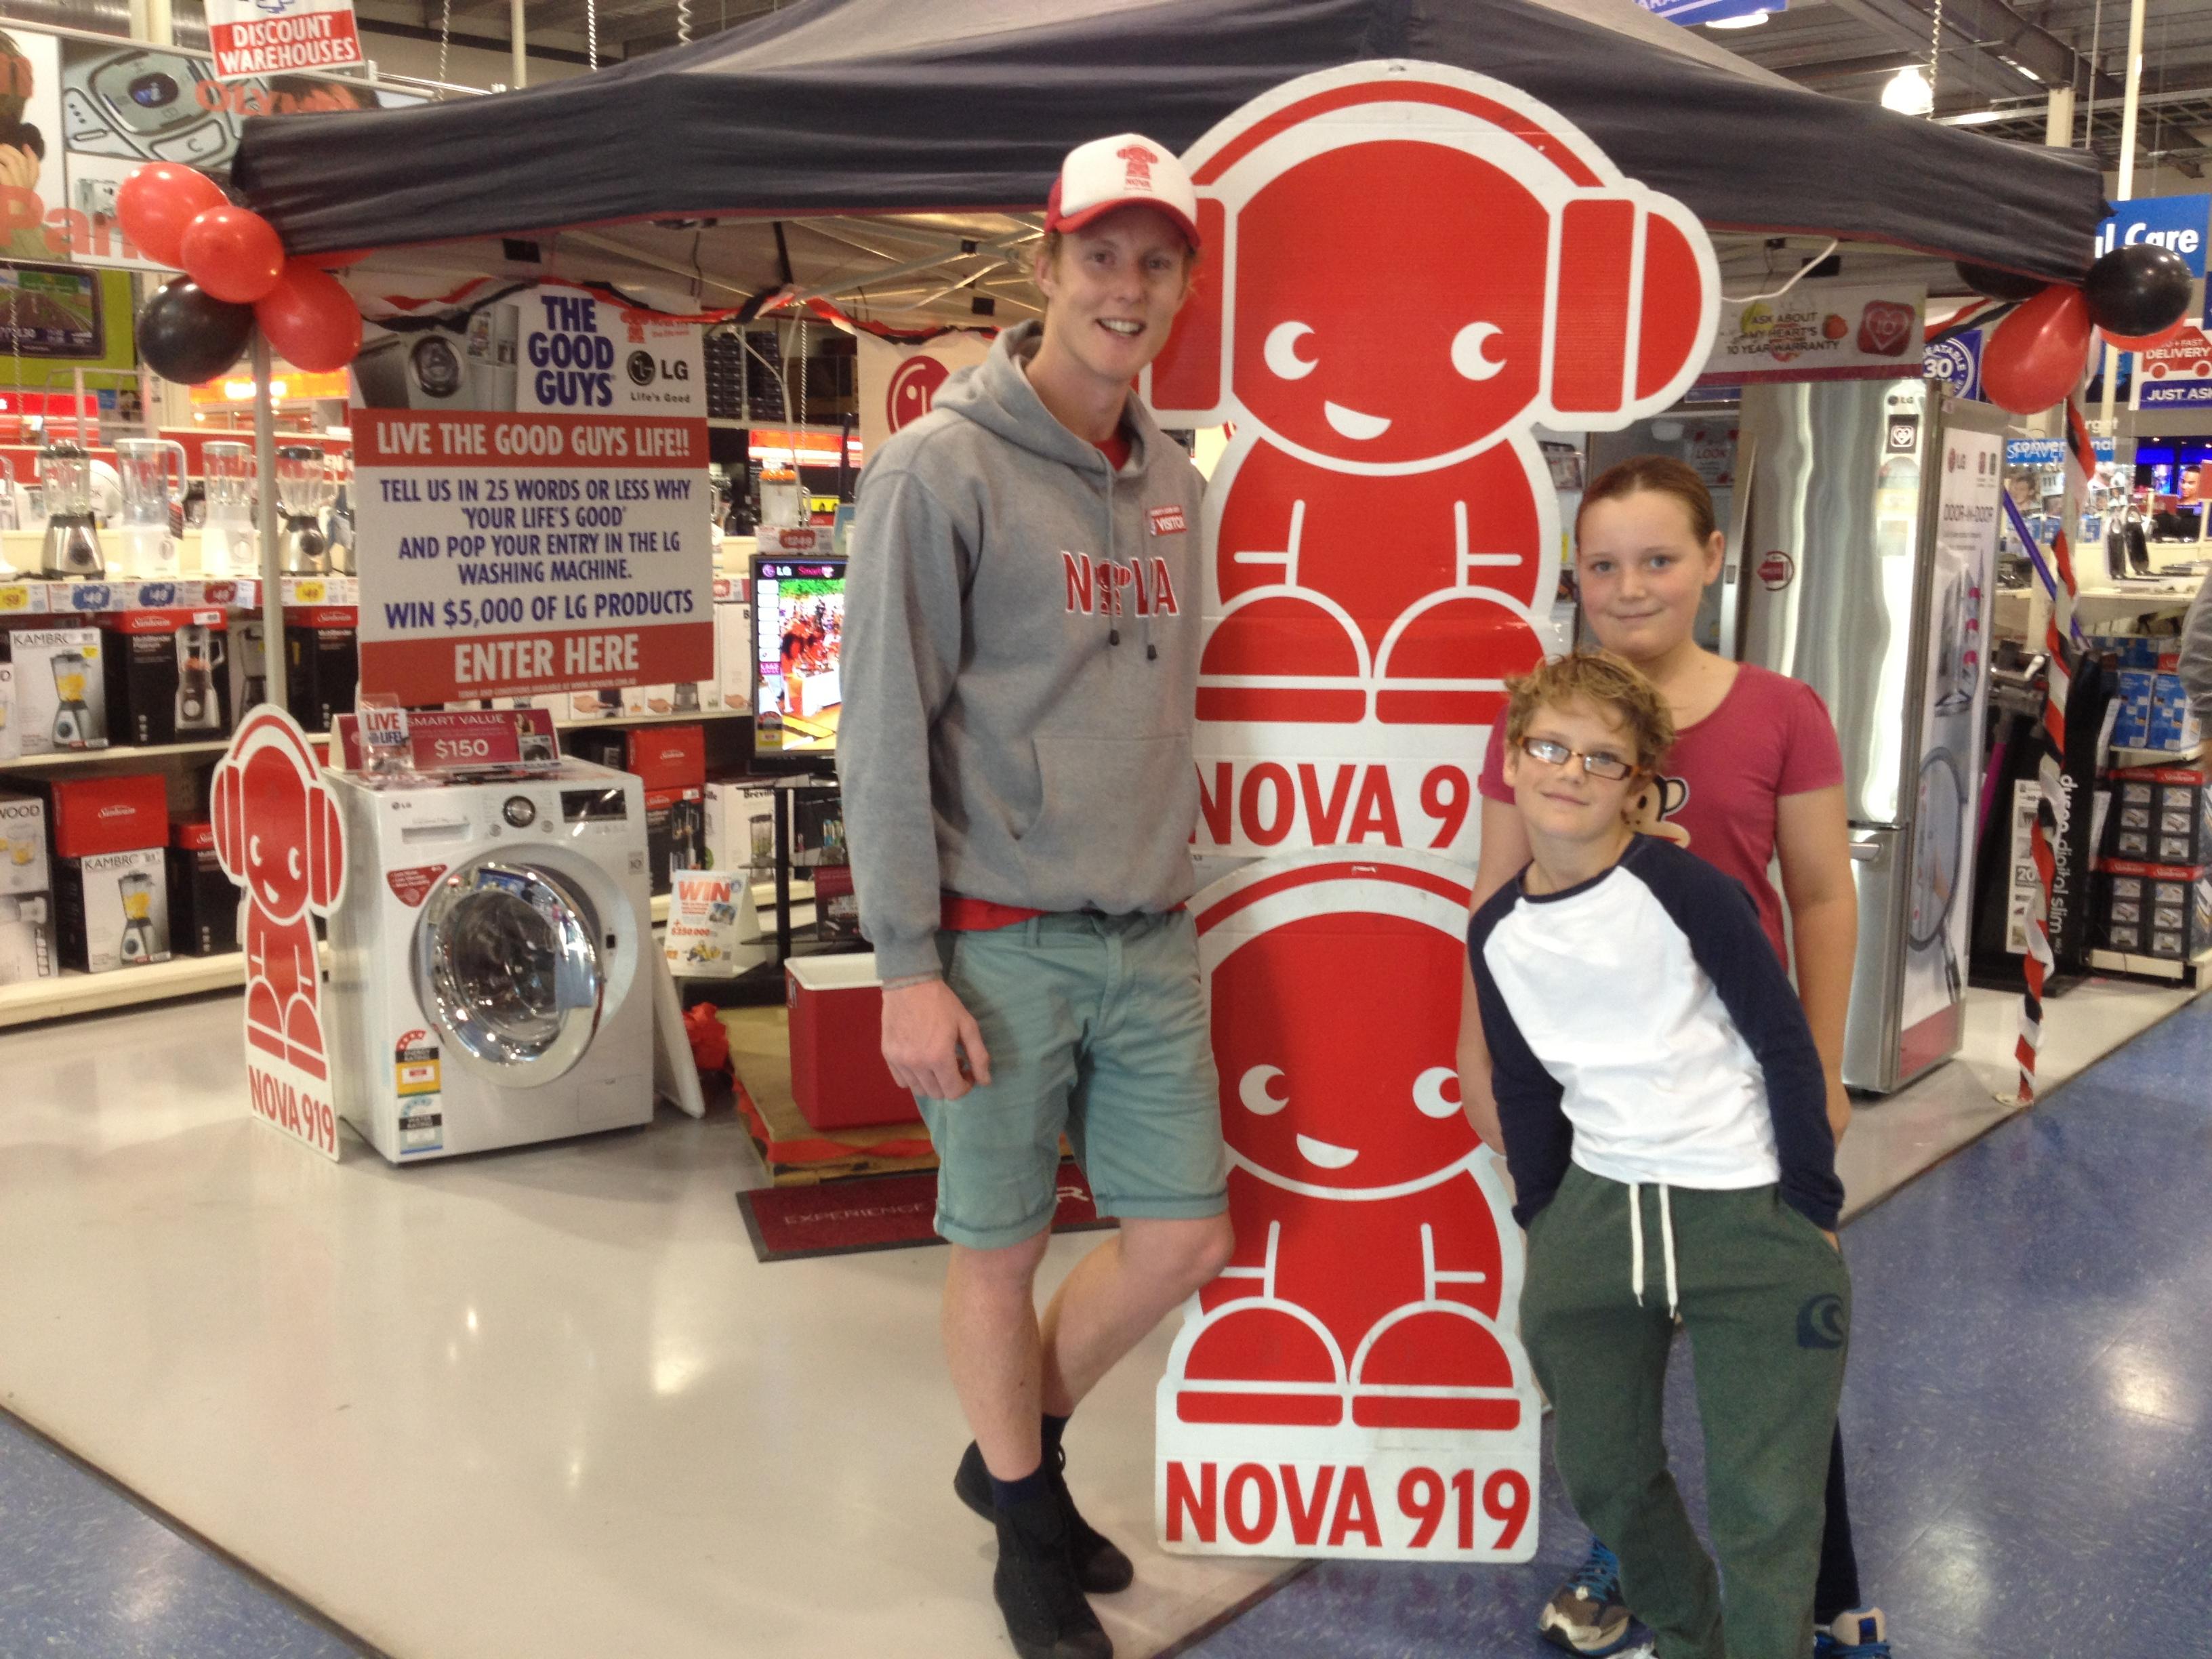 Nova 919 Casanovas - David Brooks Good Guys Mile End - 26th